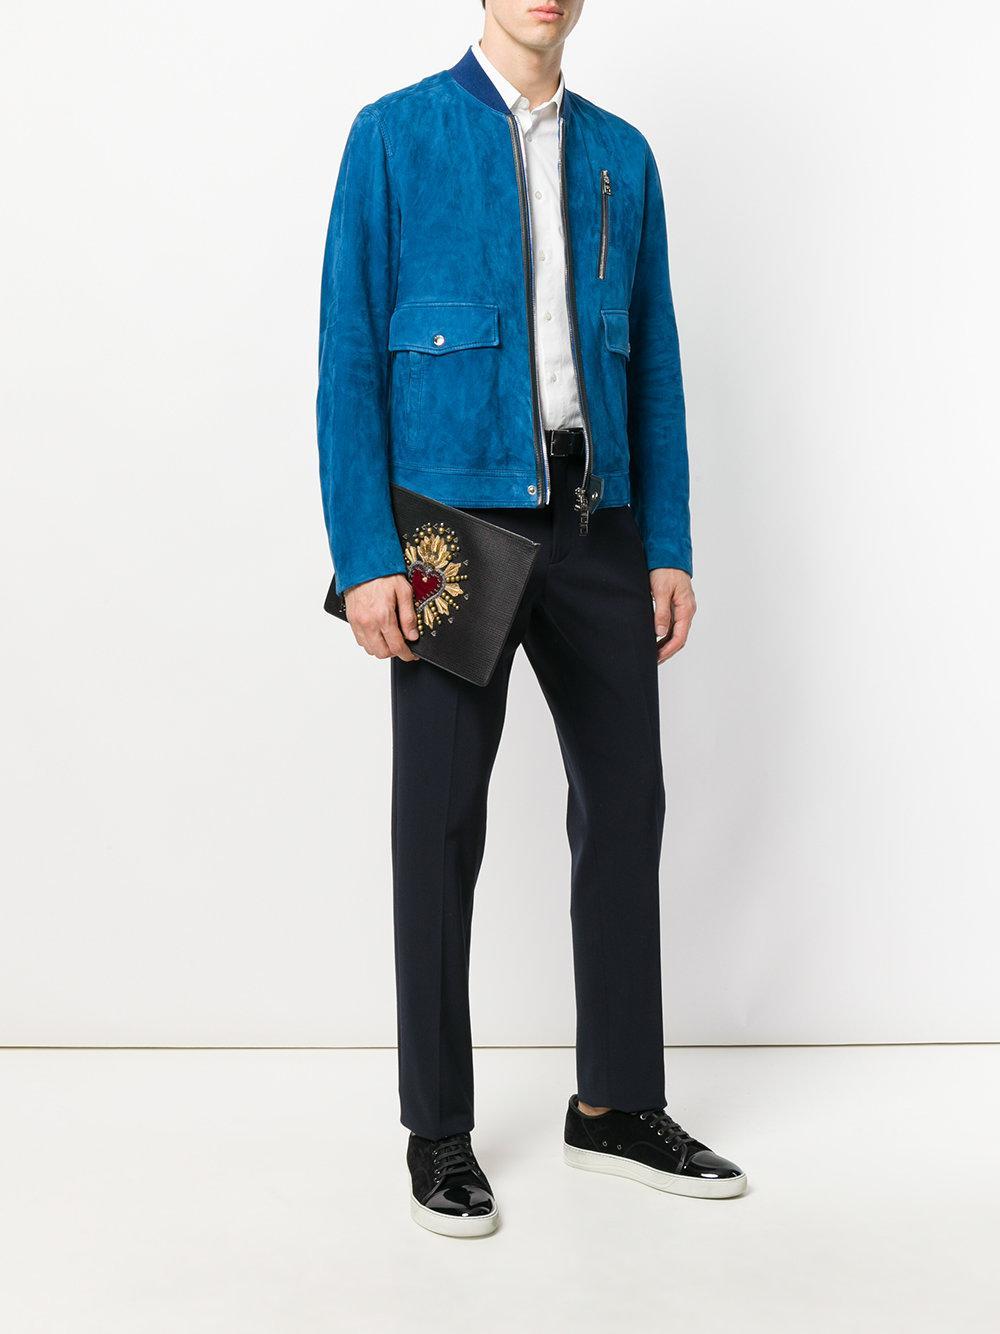 Gabbana embrague Lyst Porta parche en hombre corazón de documentos negro el Dolce con para dwpZBdq